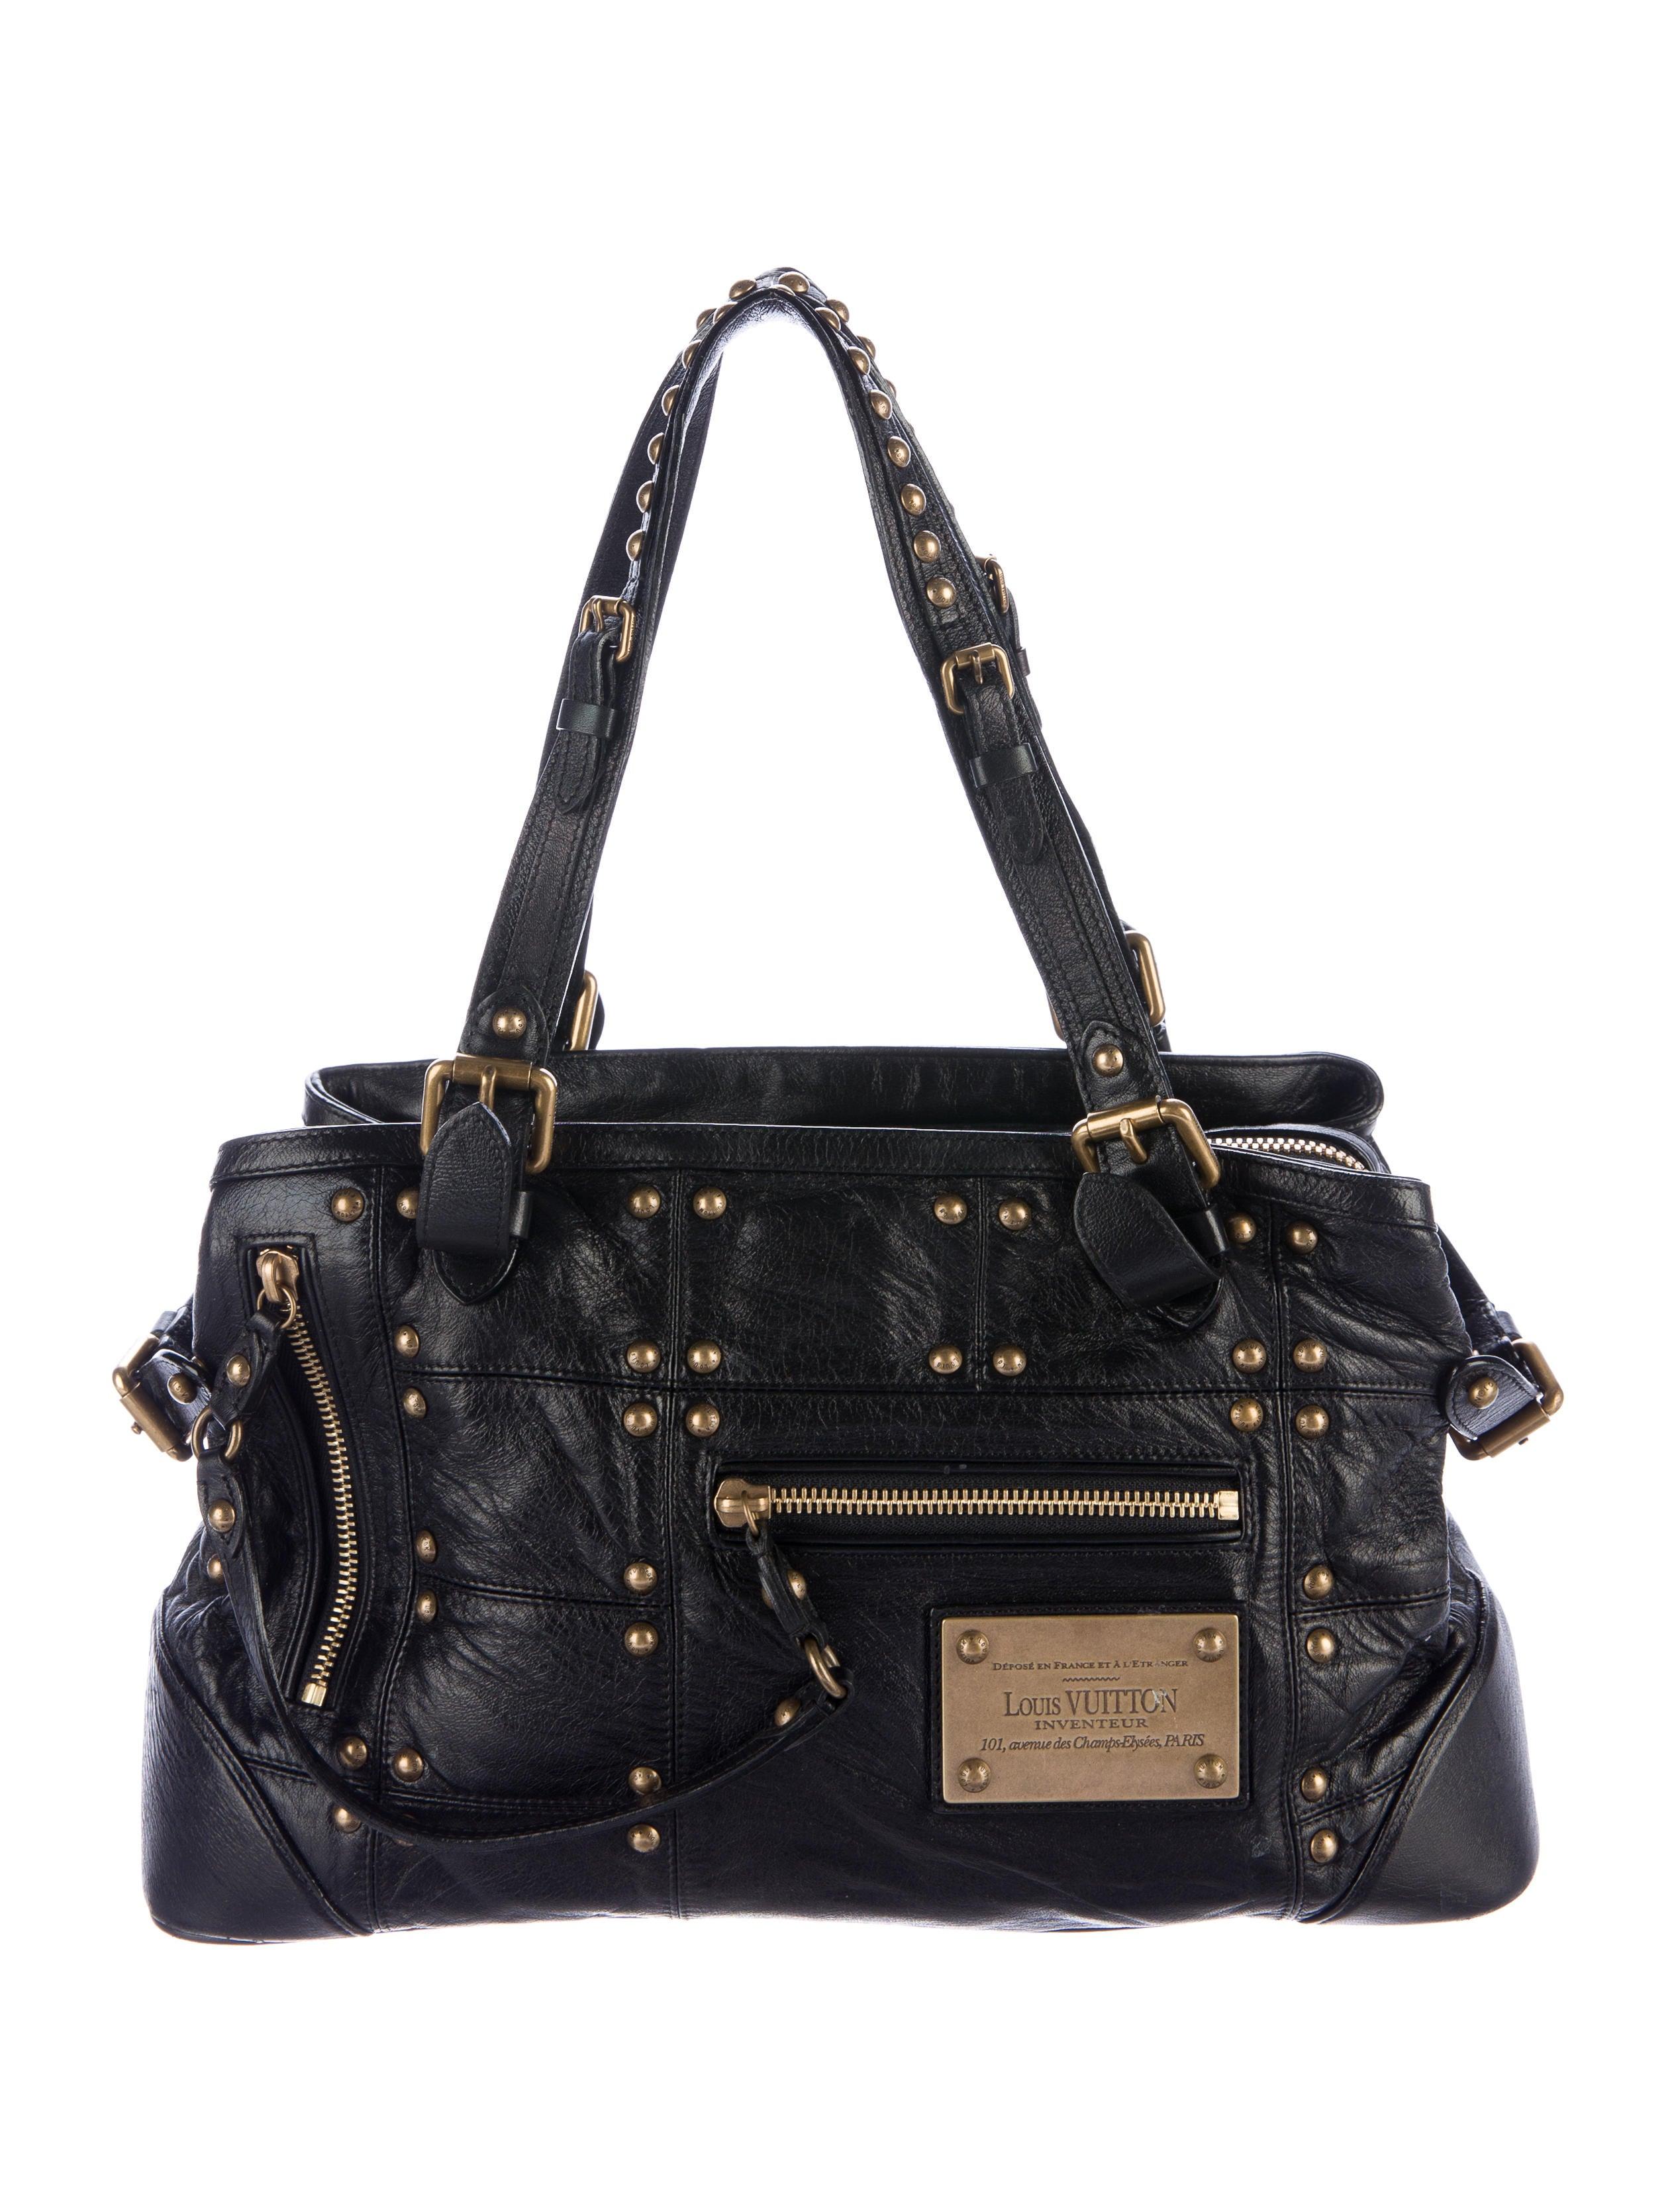 Sac Louis Vuitton Matelassé : Louis vuitton sac riveting bag handbags lou